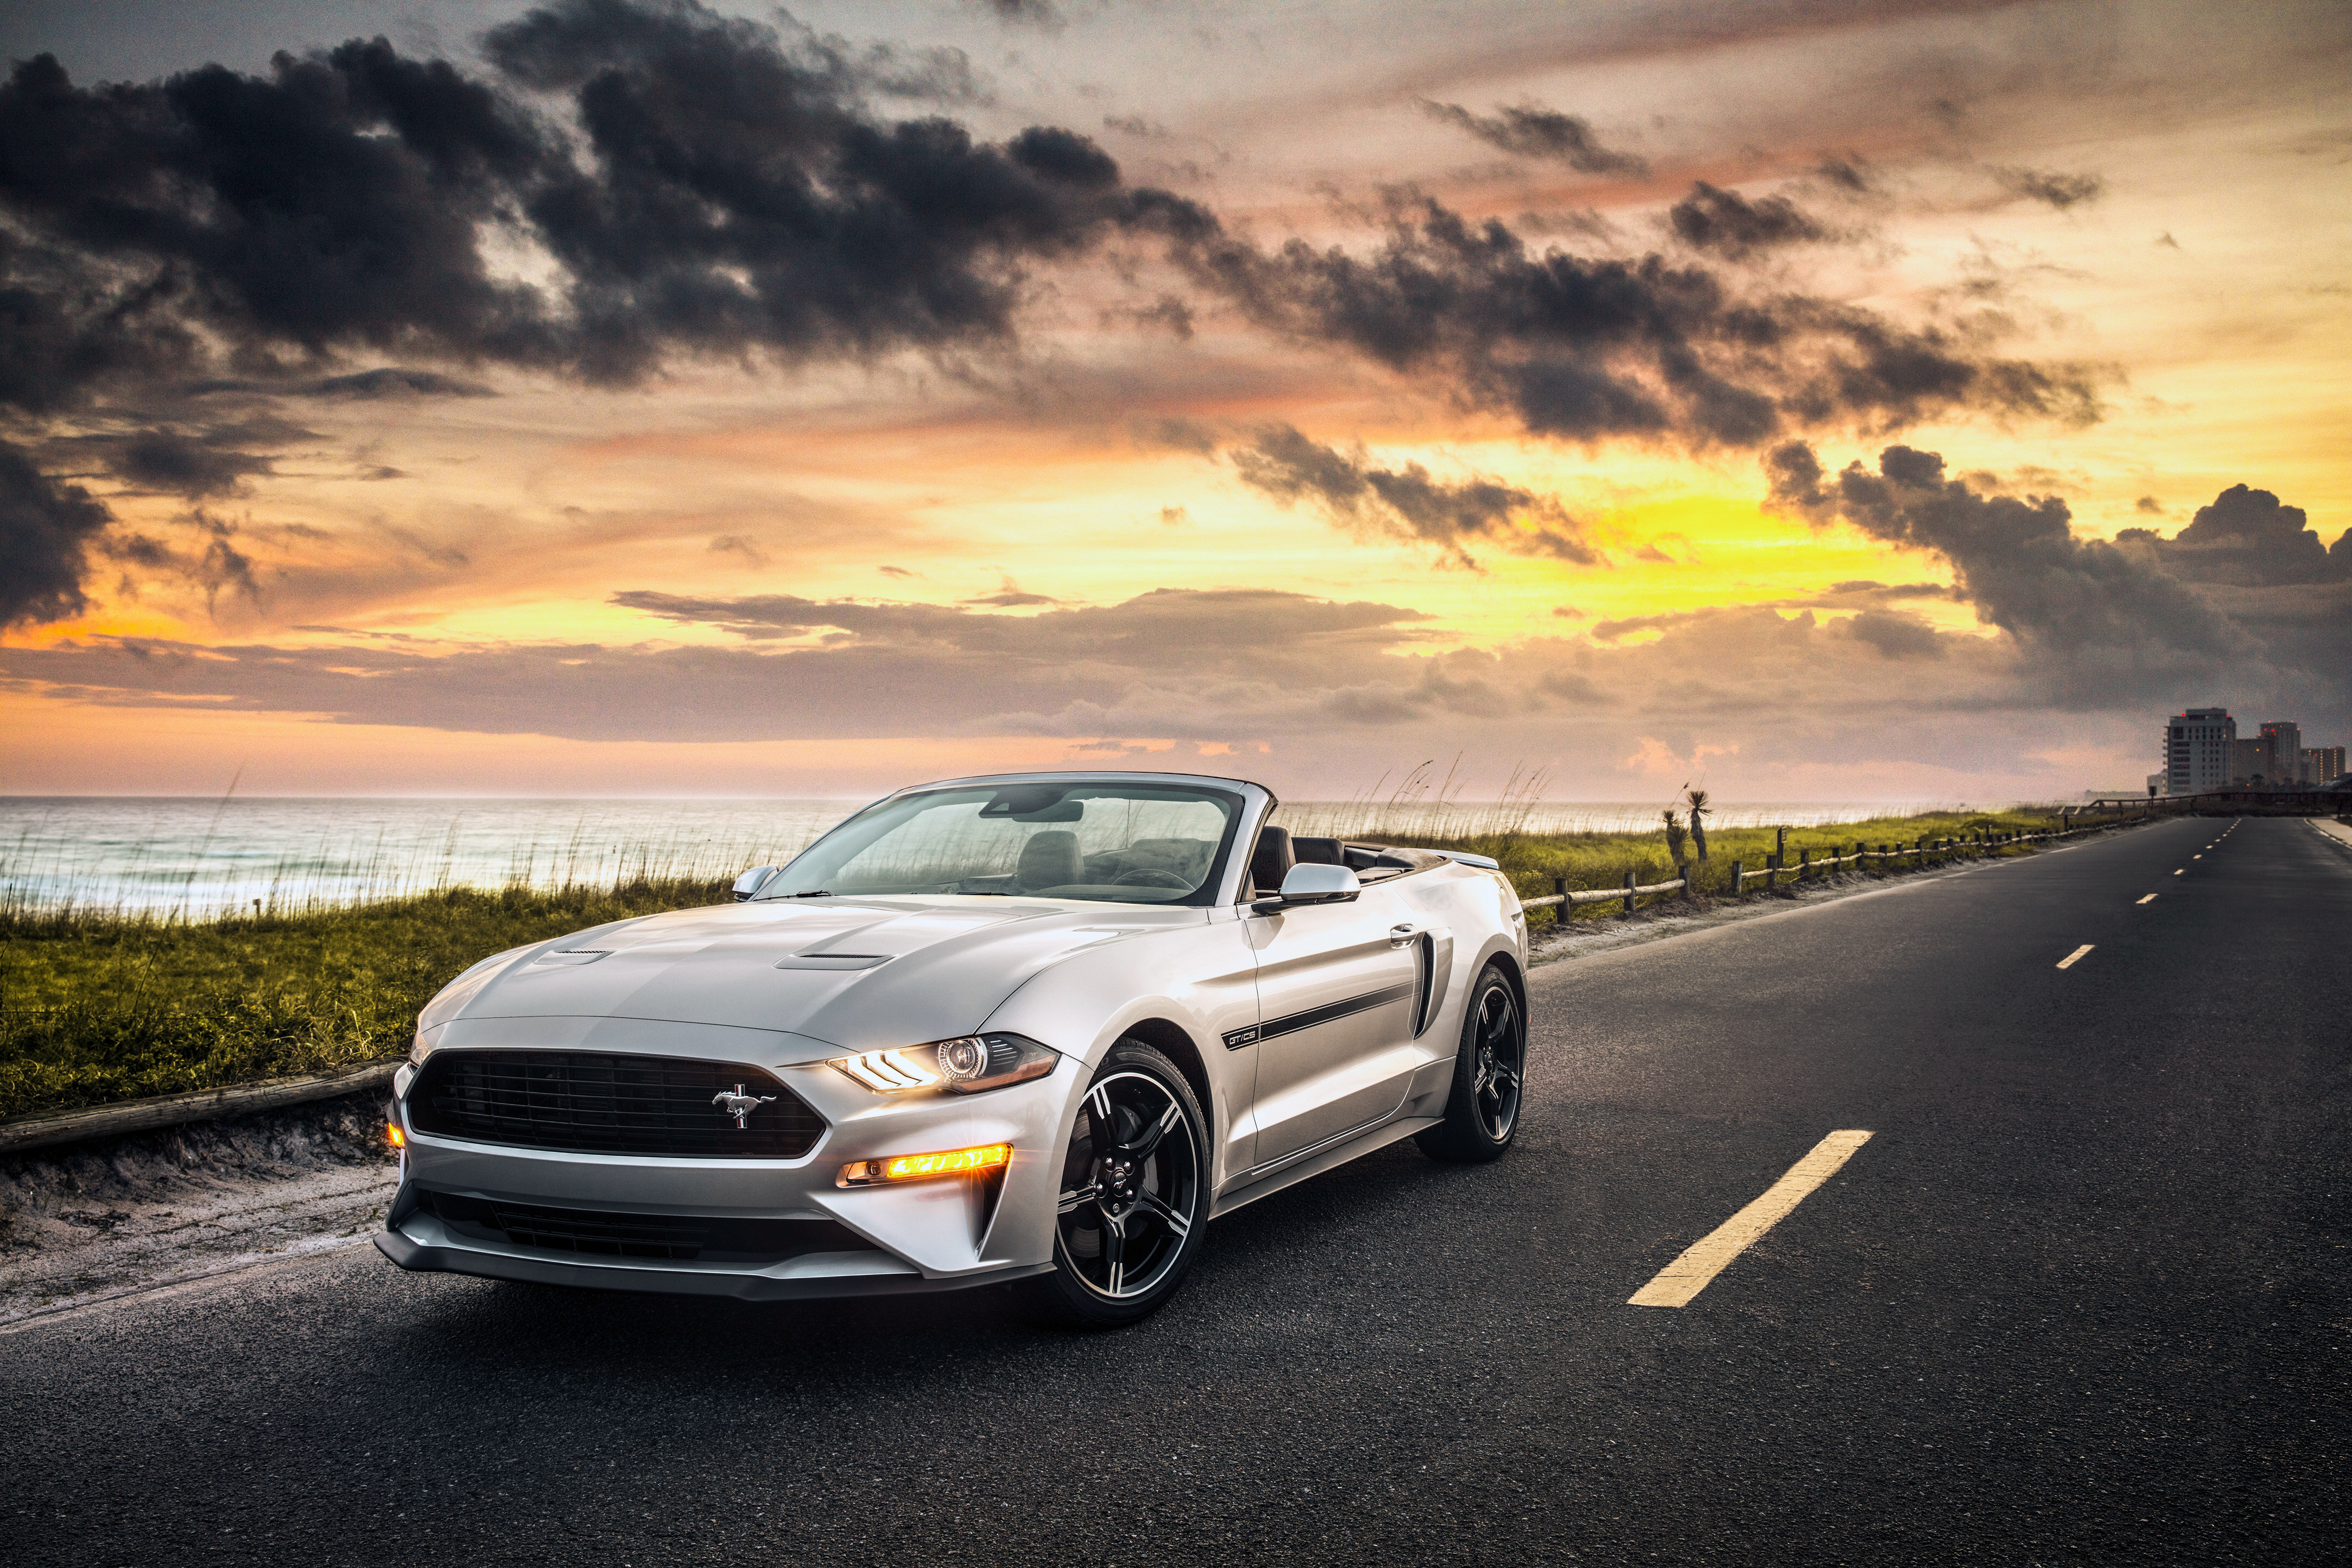 Ford Mustang GT Convertible 2019 4k, HD Cars, 4k ...